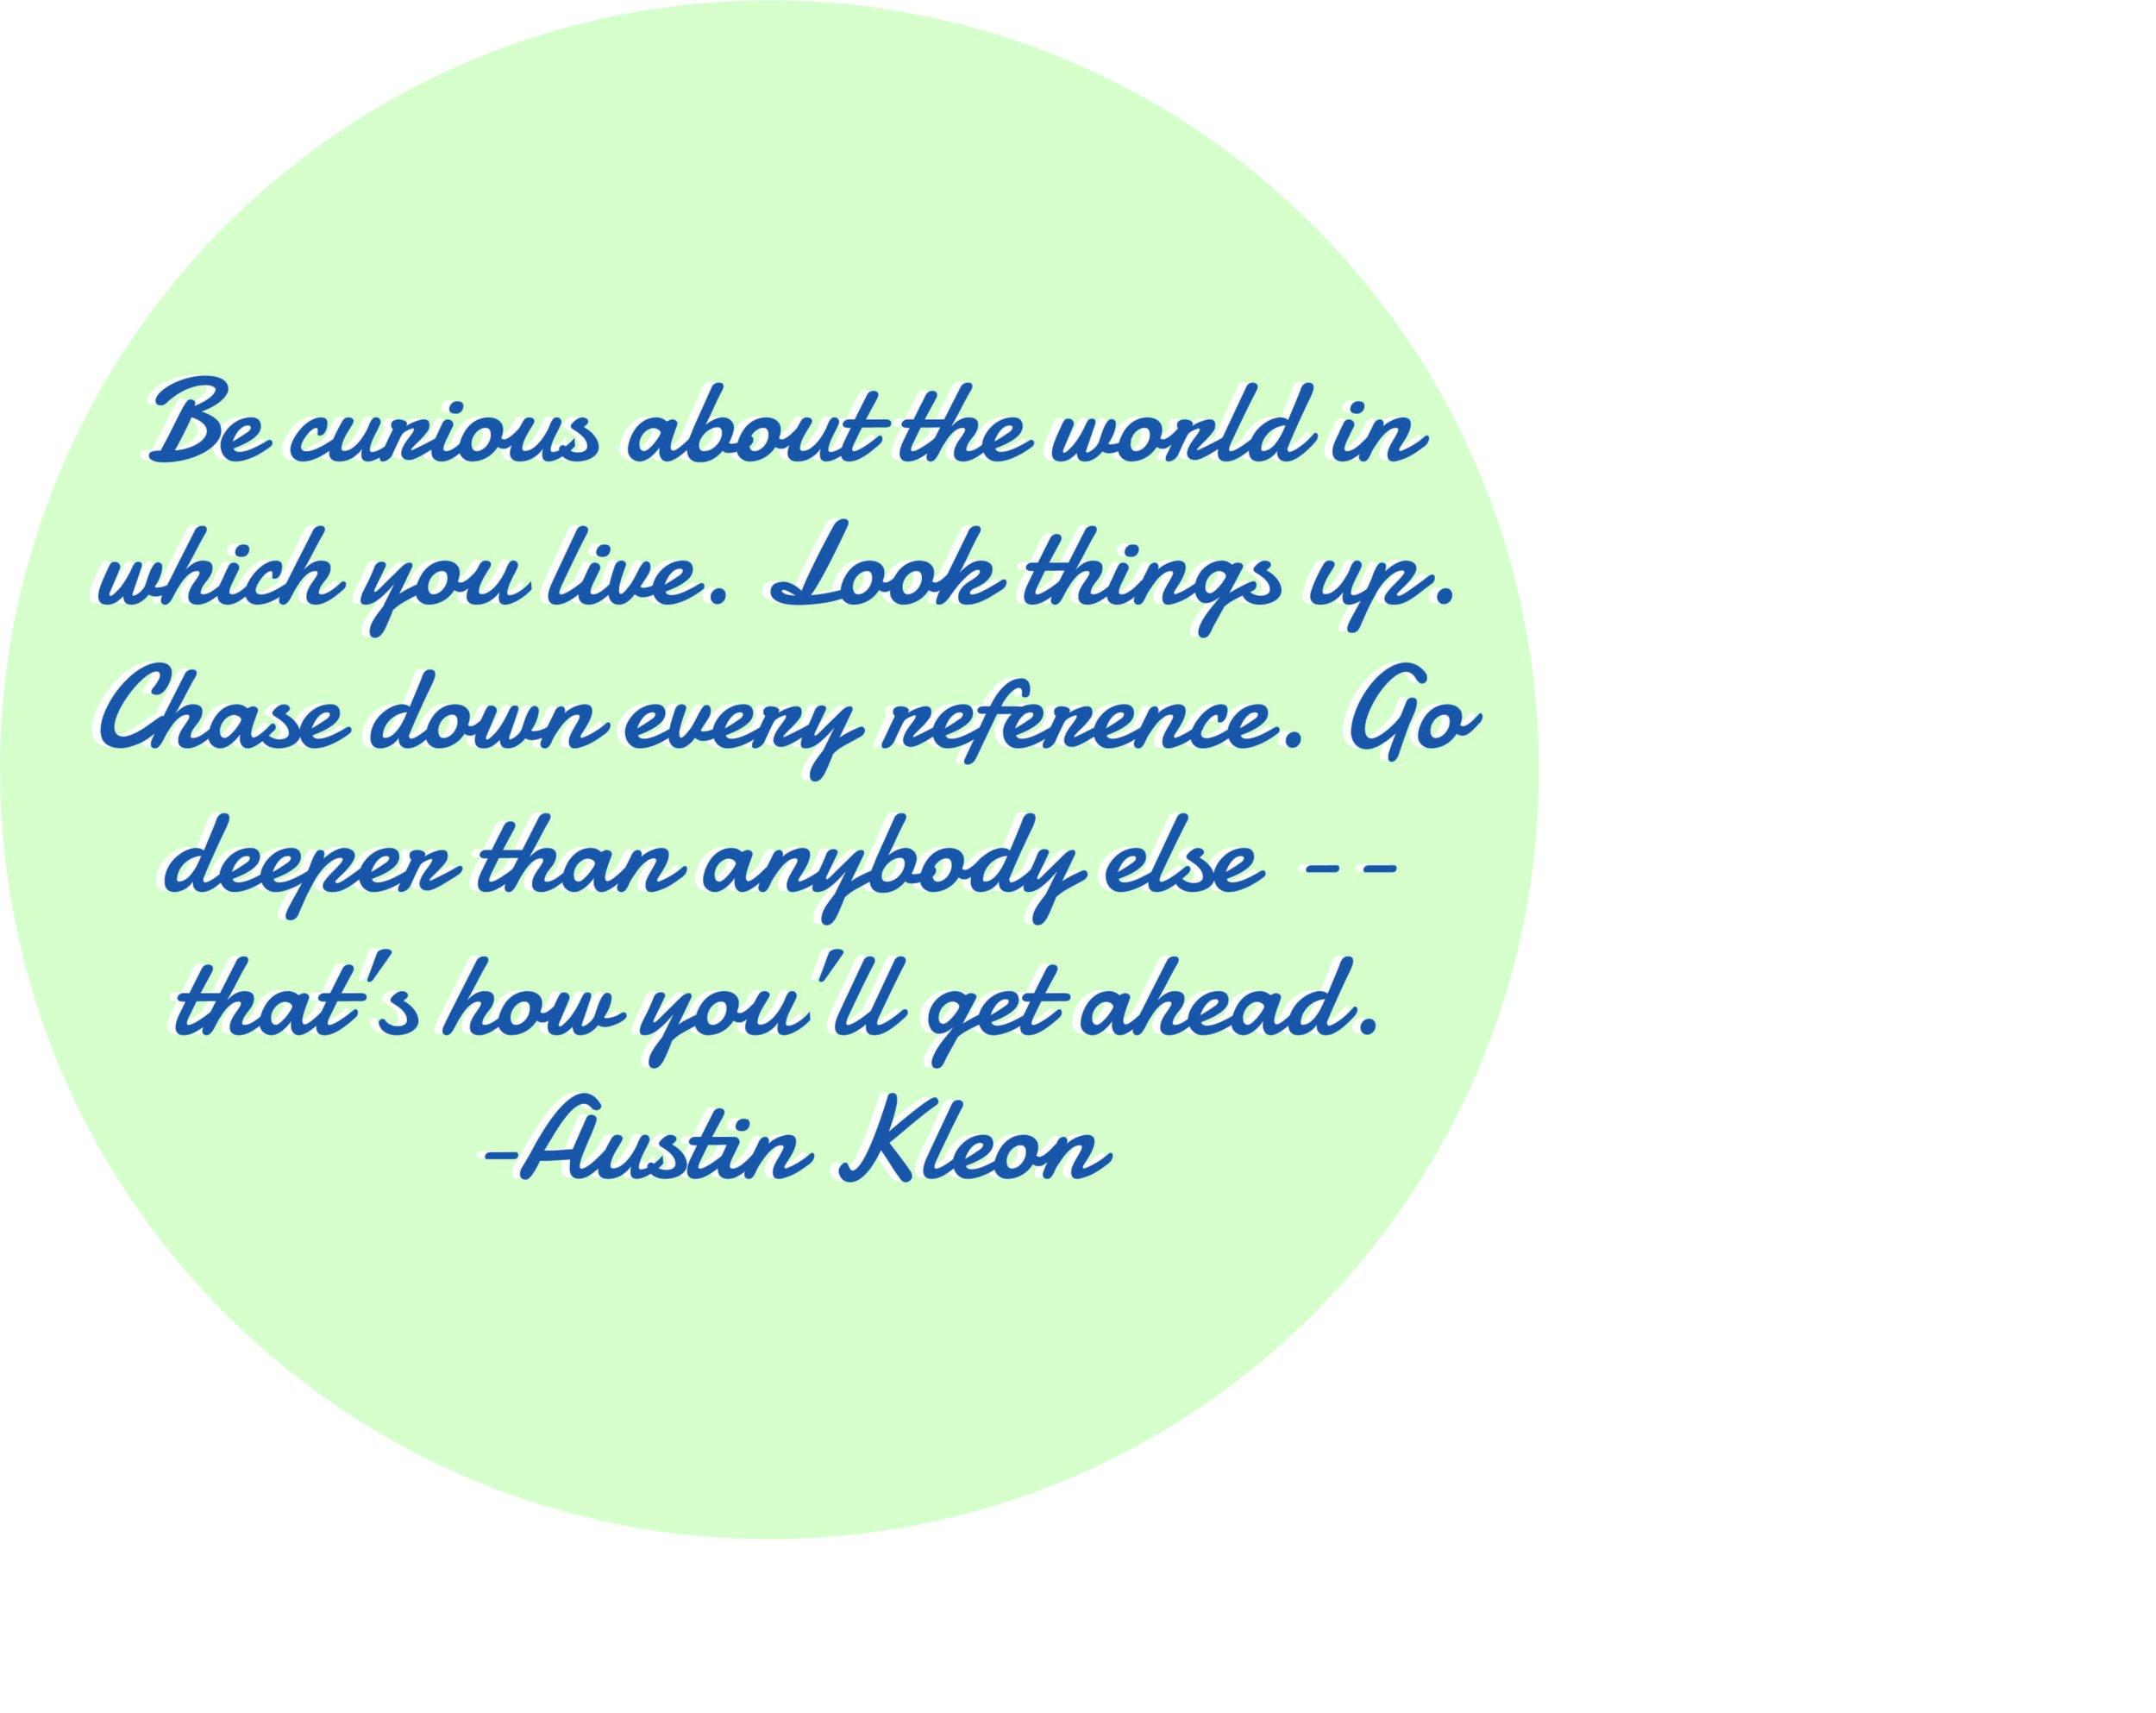 Austin Kleon quote 1.jpg